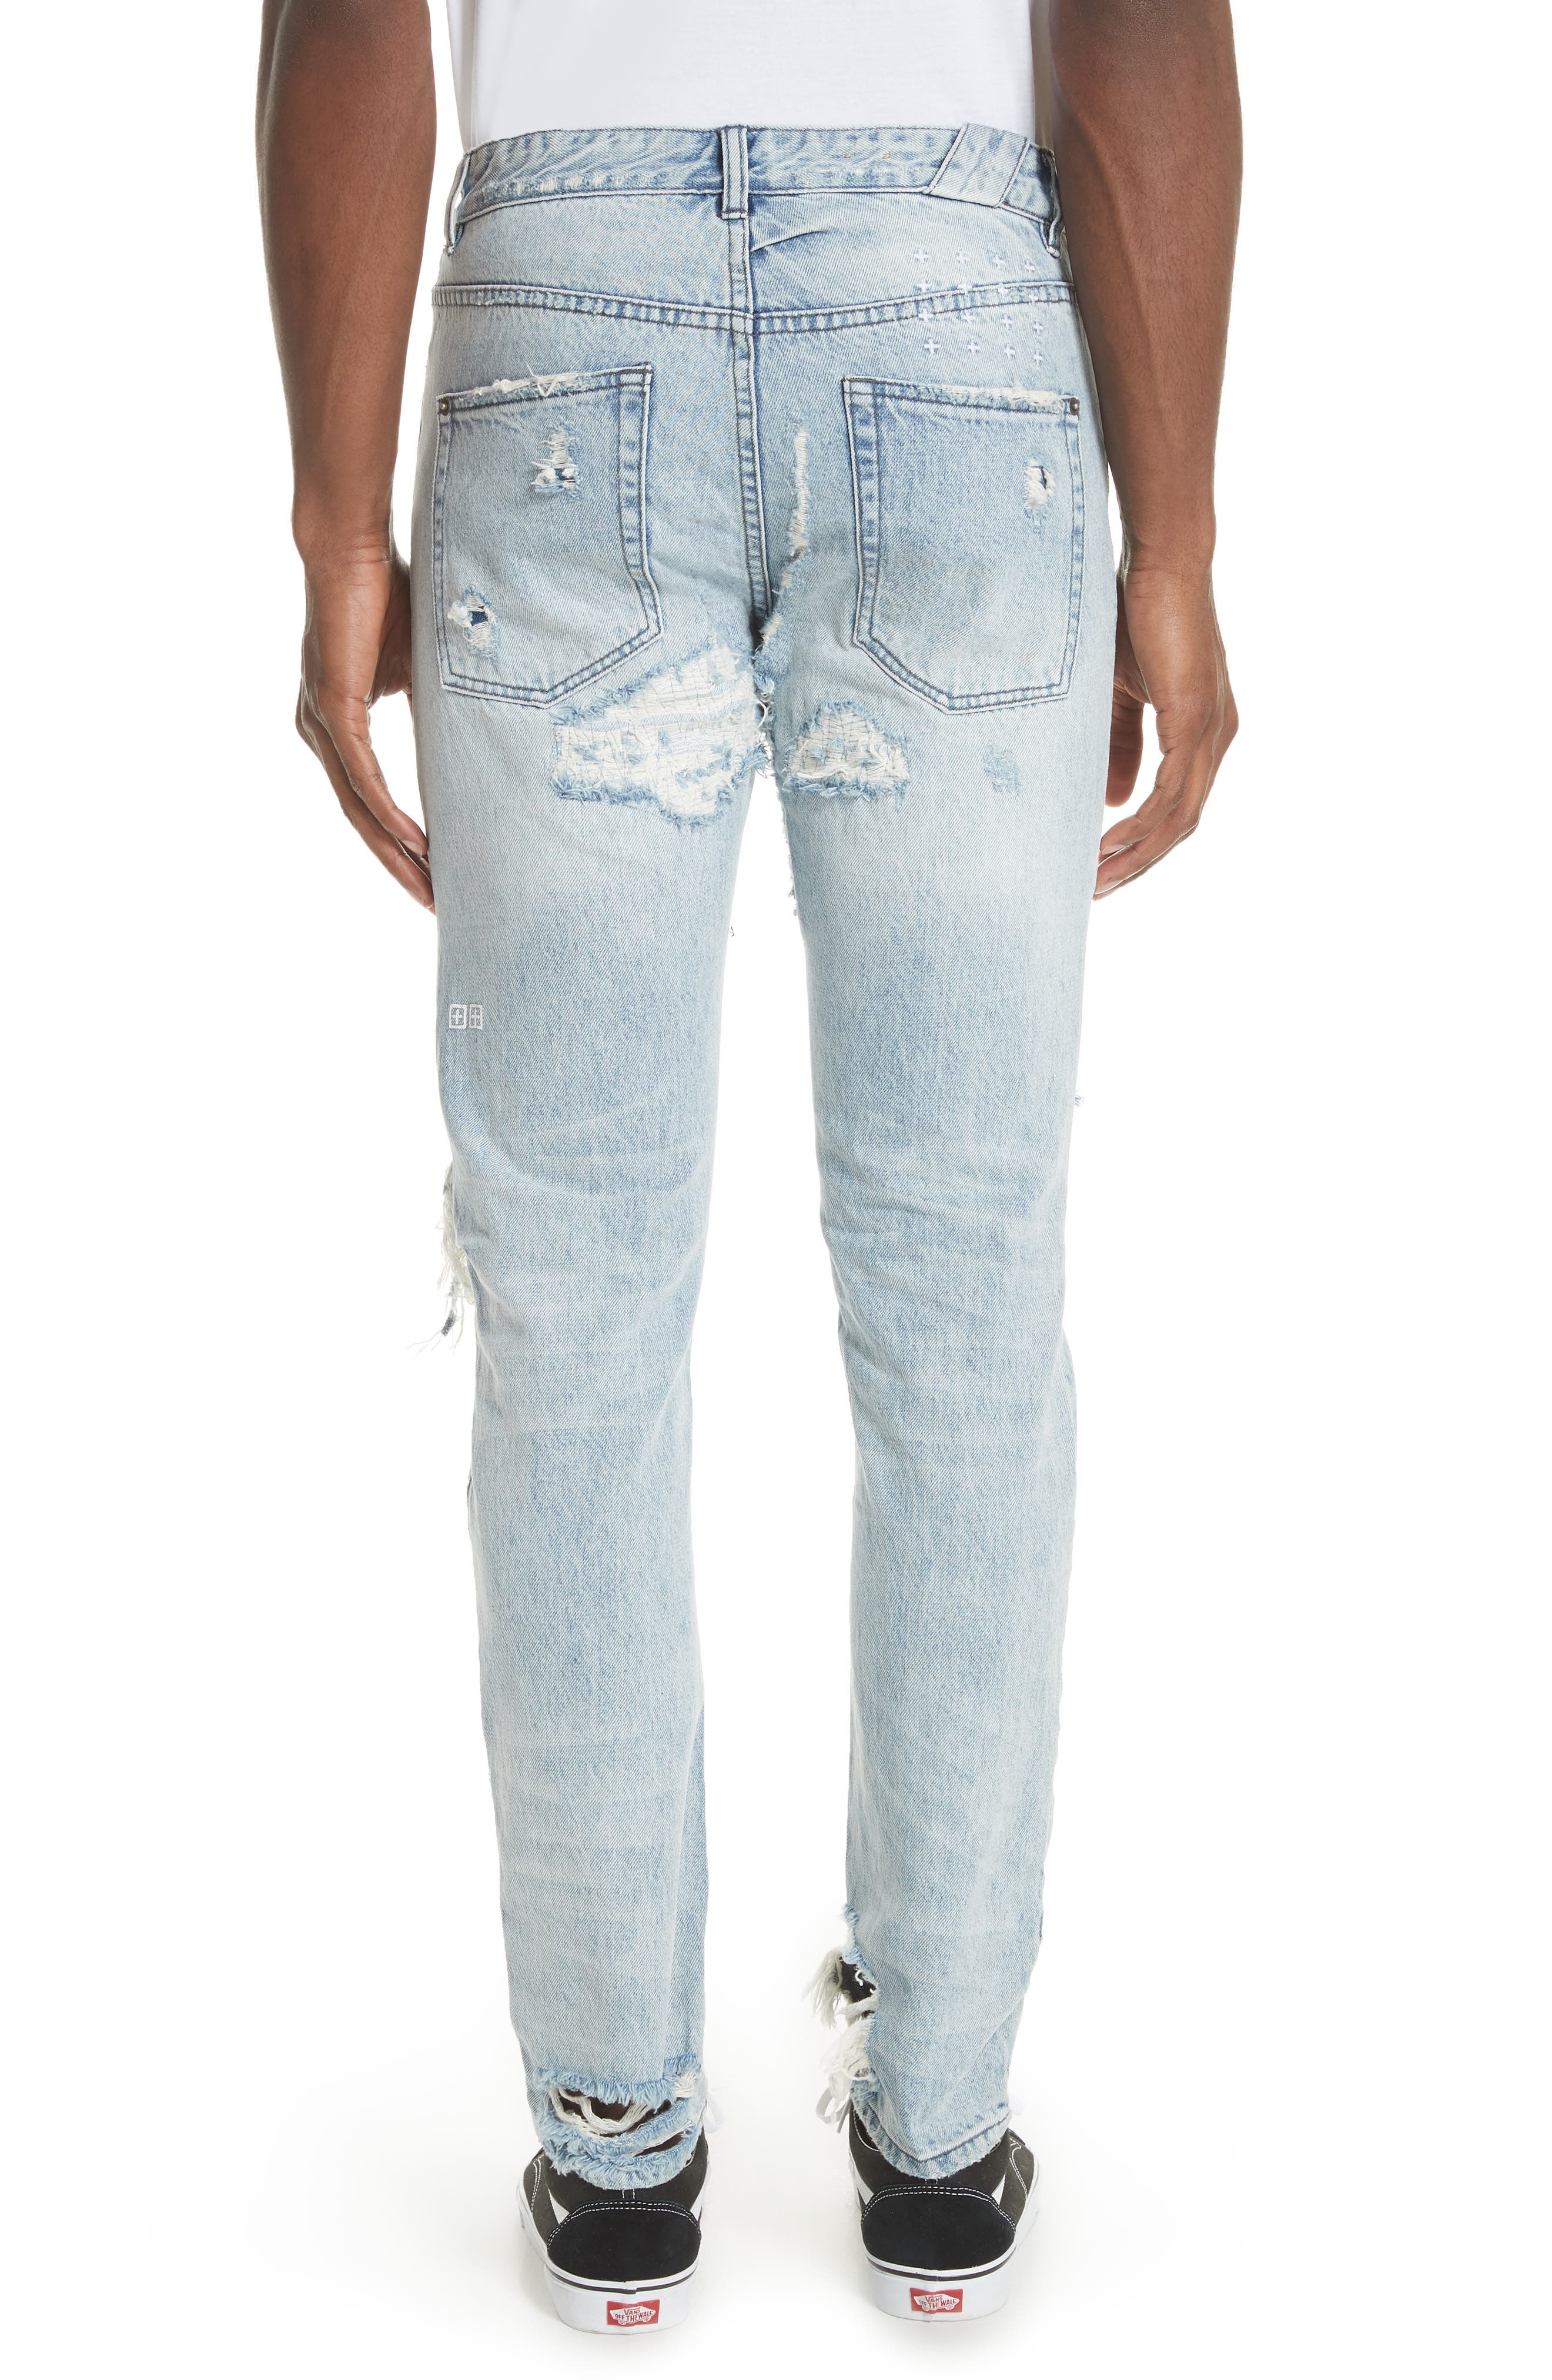 Chitch Tropo Trash Jeans,                             Alternate thumbnail 2, color,                             DENIM